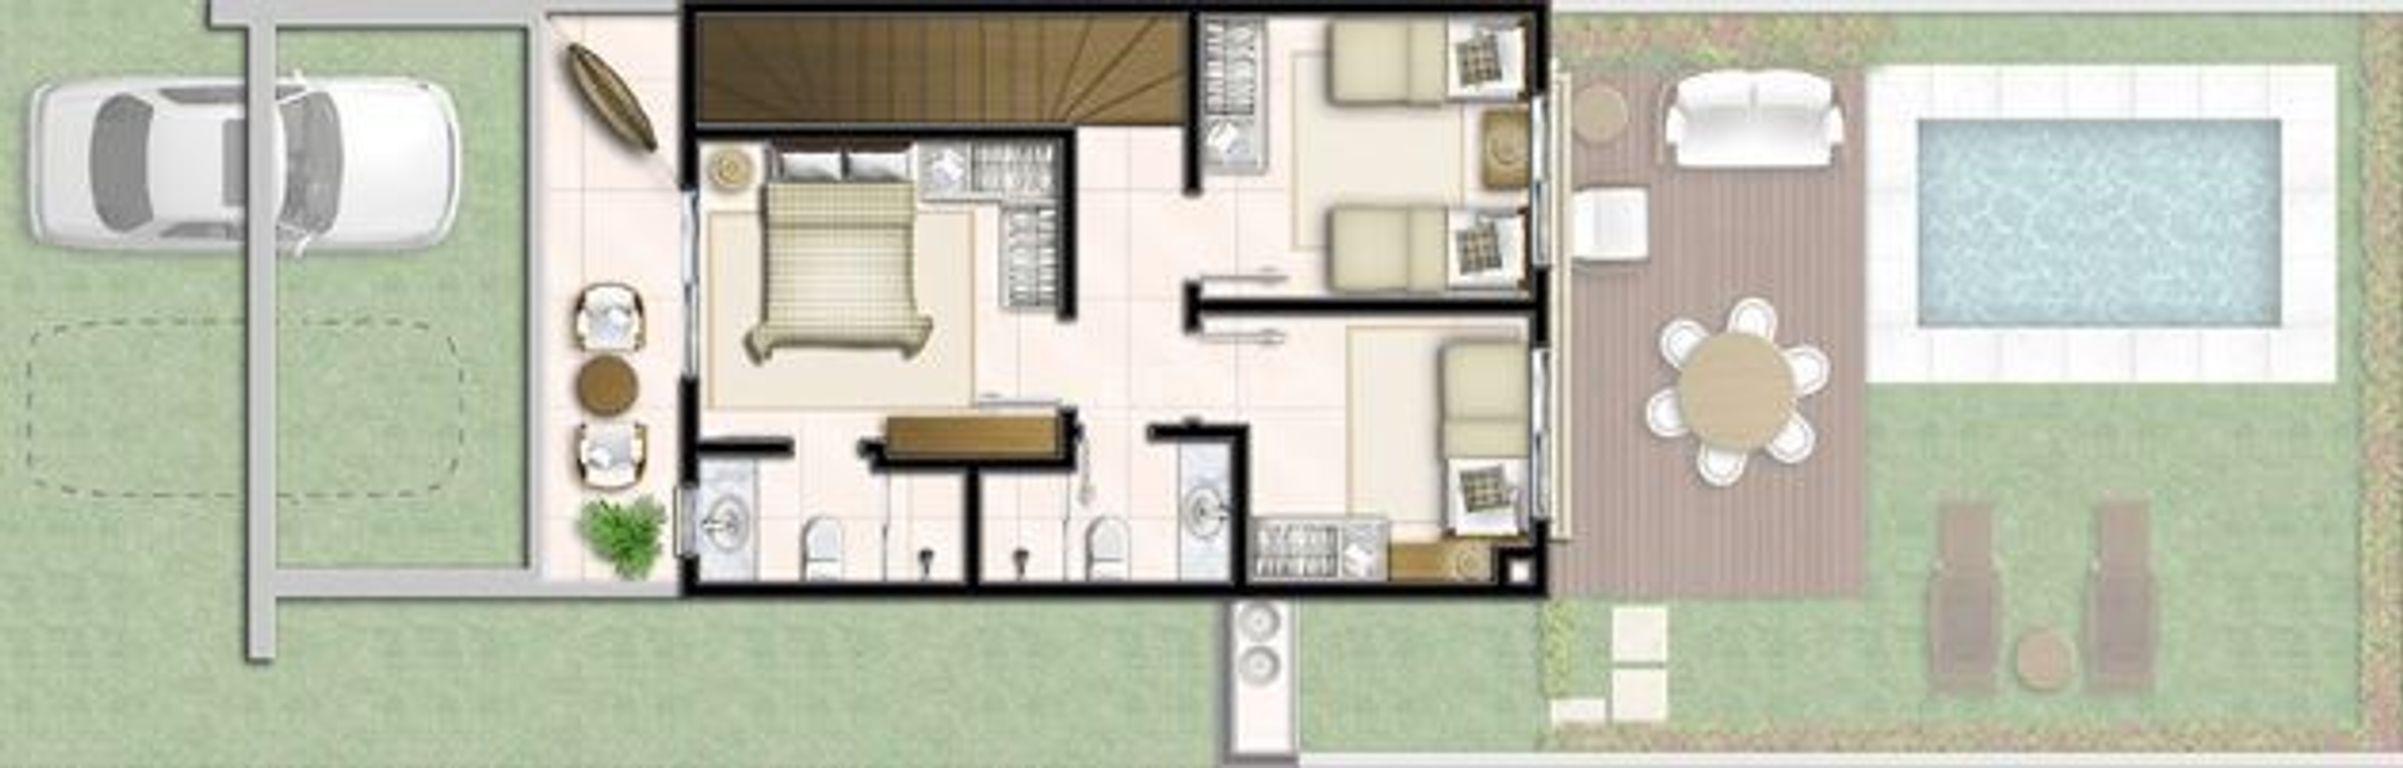 Casa 3 Dorm, Centro, Xangri-lá (147089) - Foto 14